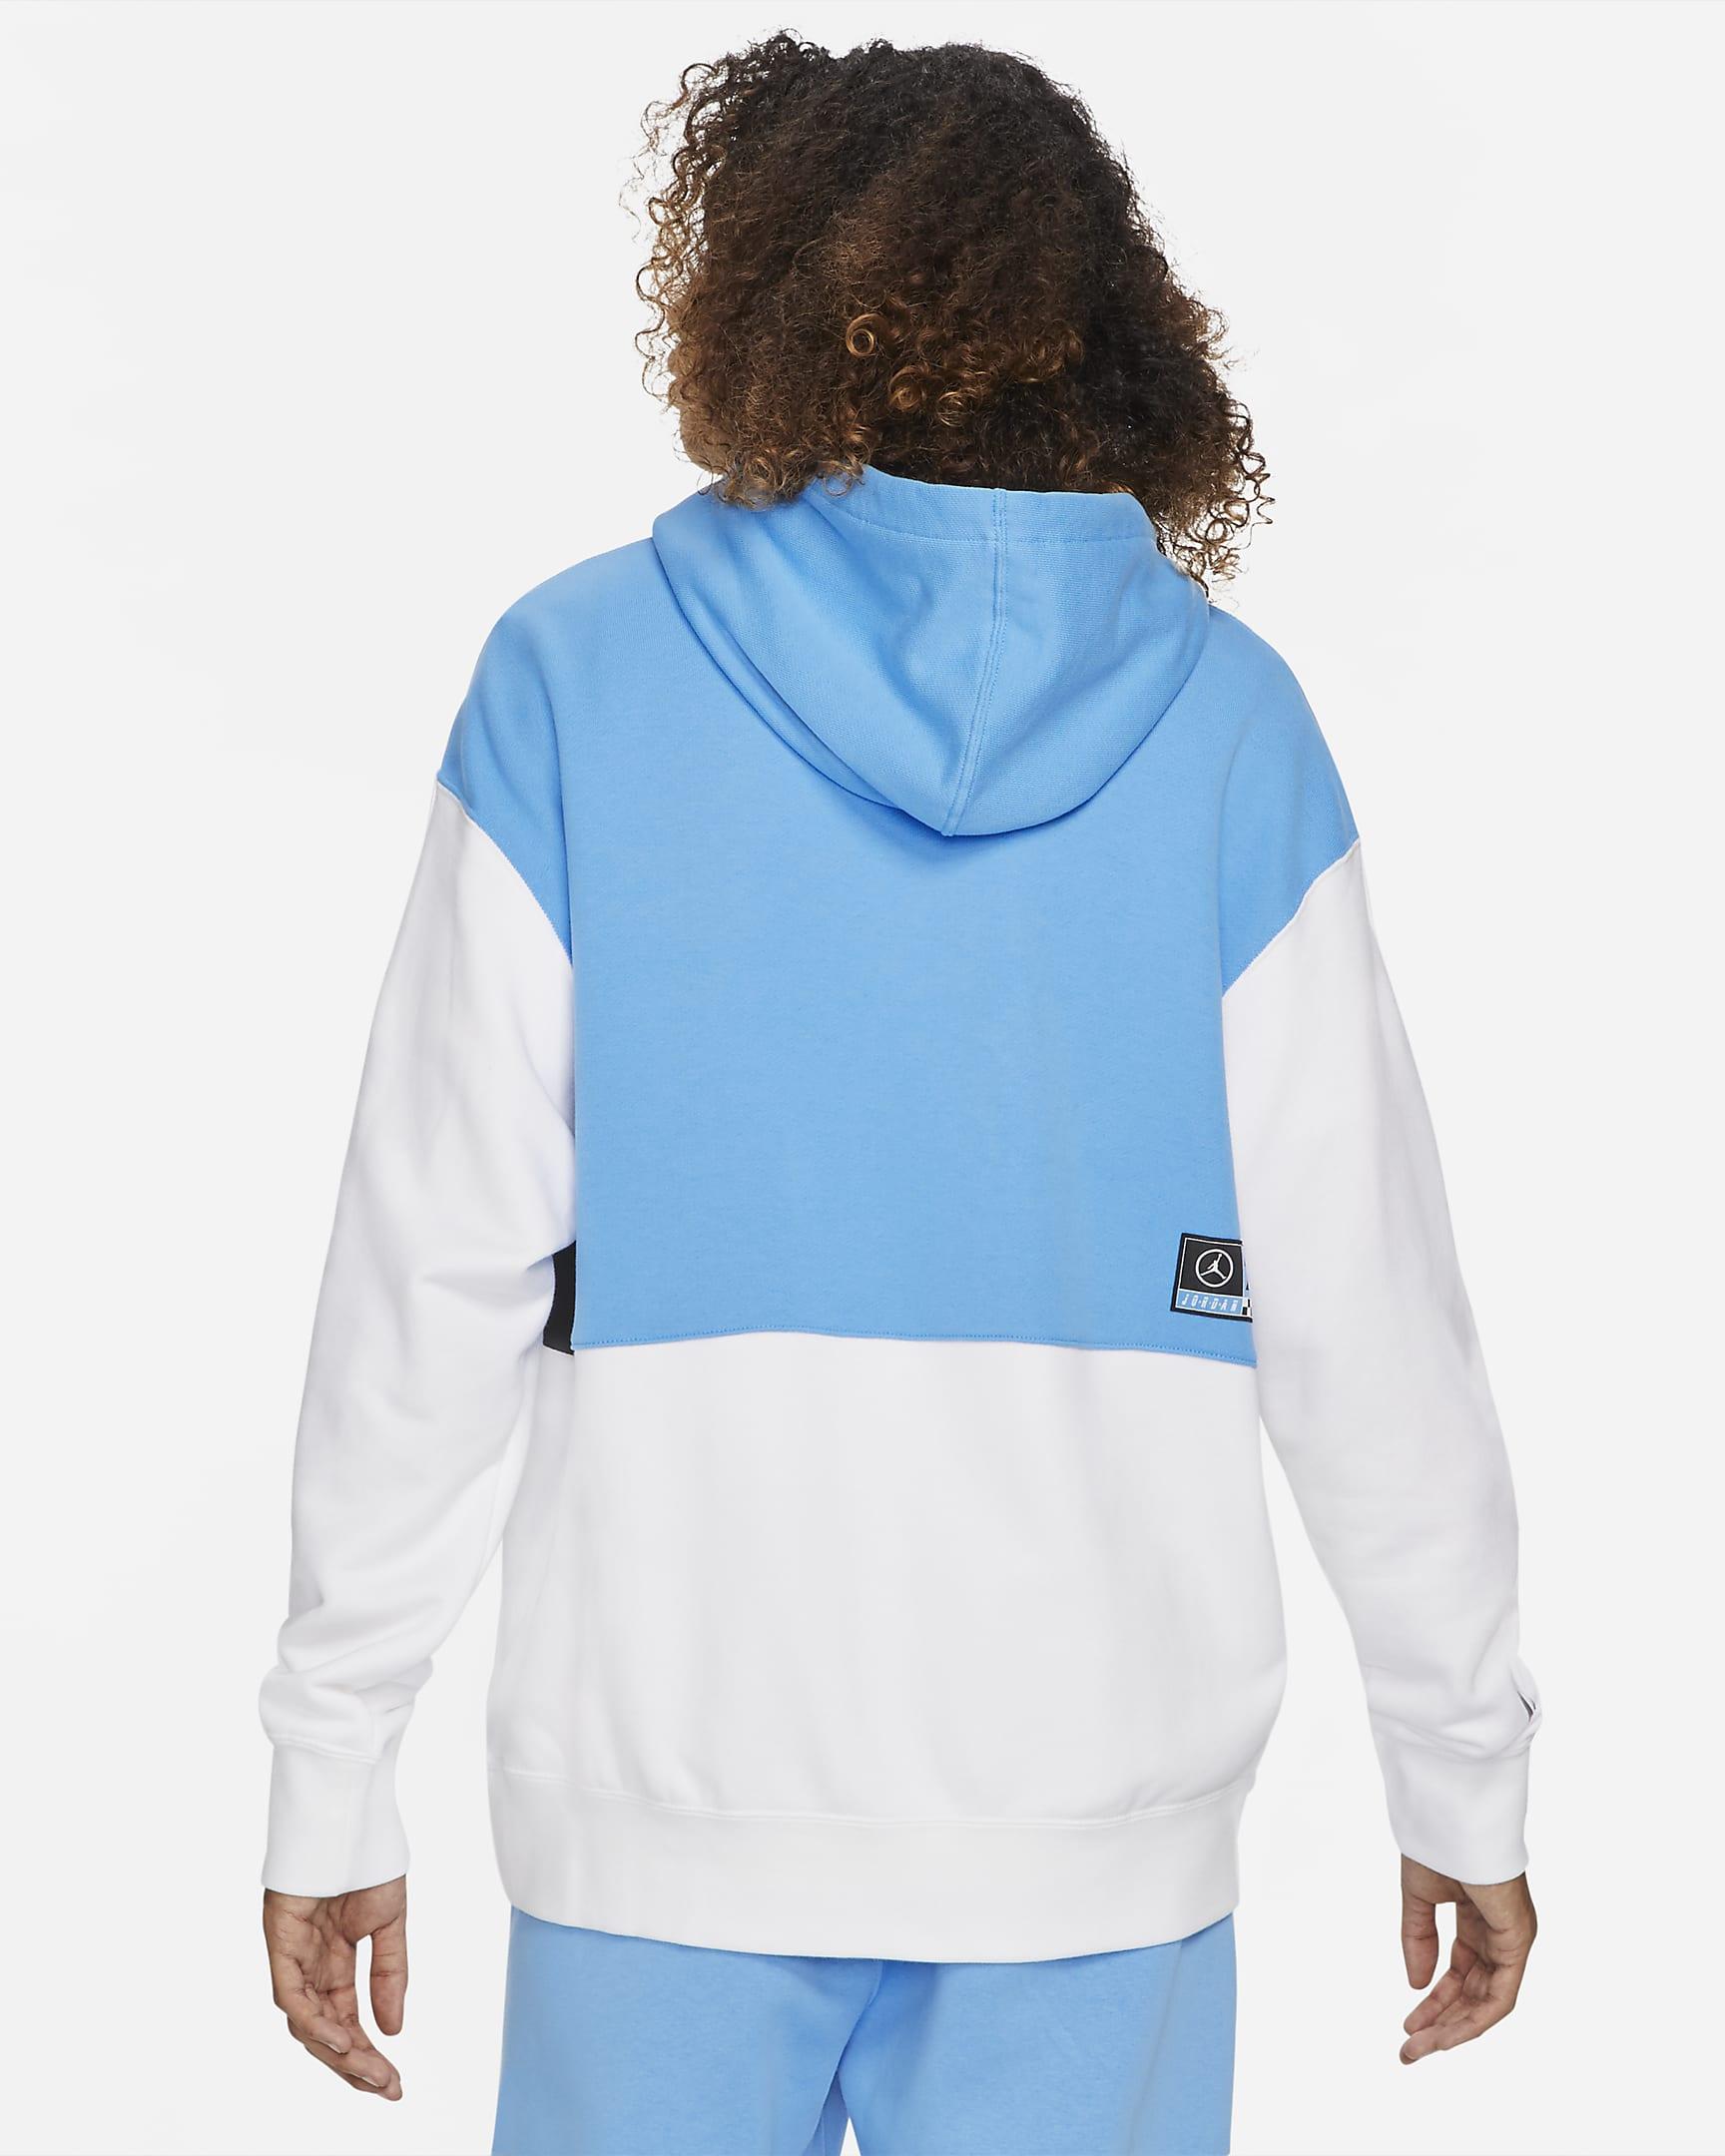 jordan-sport-dna-mens-pullover-hoodie-rMj8Rw-2